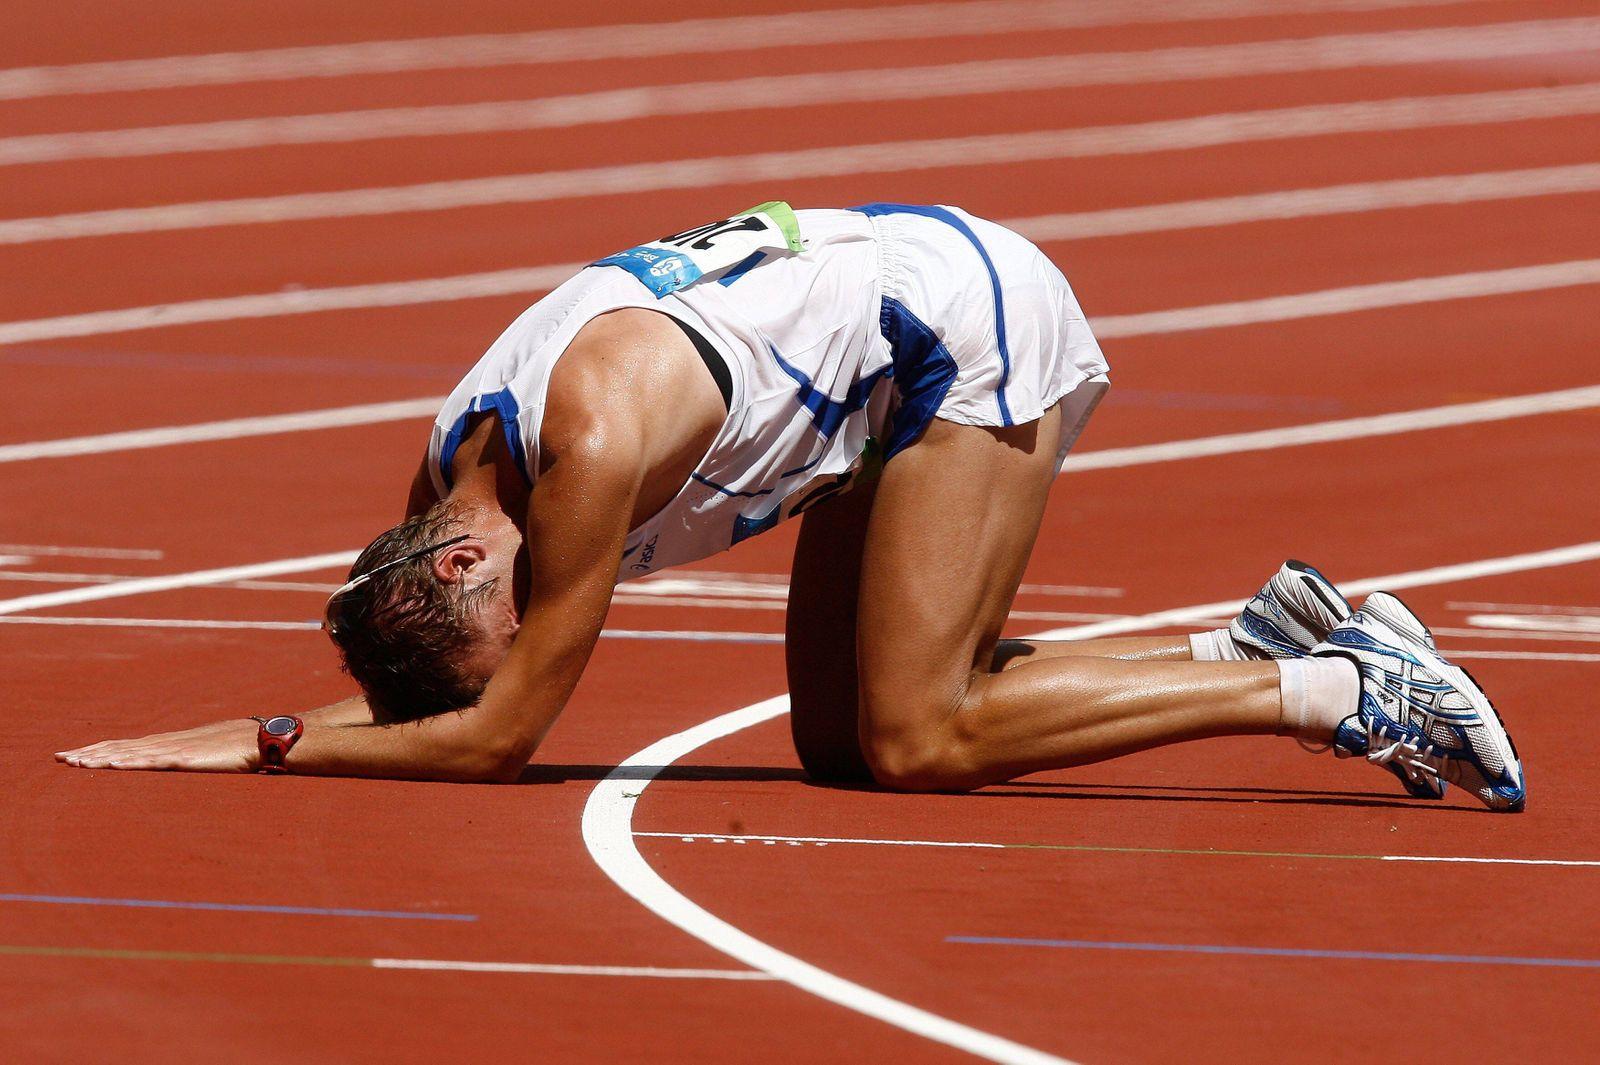 Alex Schwazer (Italien) - Olympiasieger 2008 über 50km Gehen - PUBLICATIONxNOTxINxFRAxITA (pan27567)